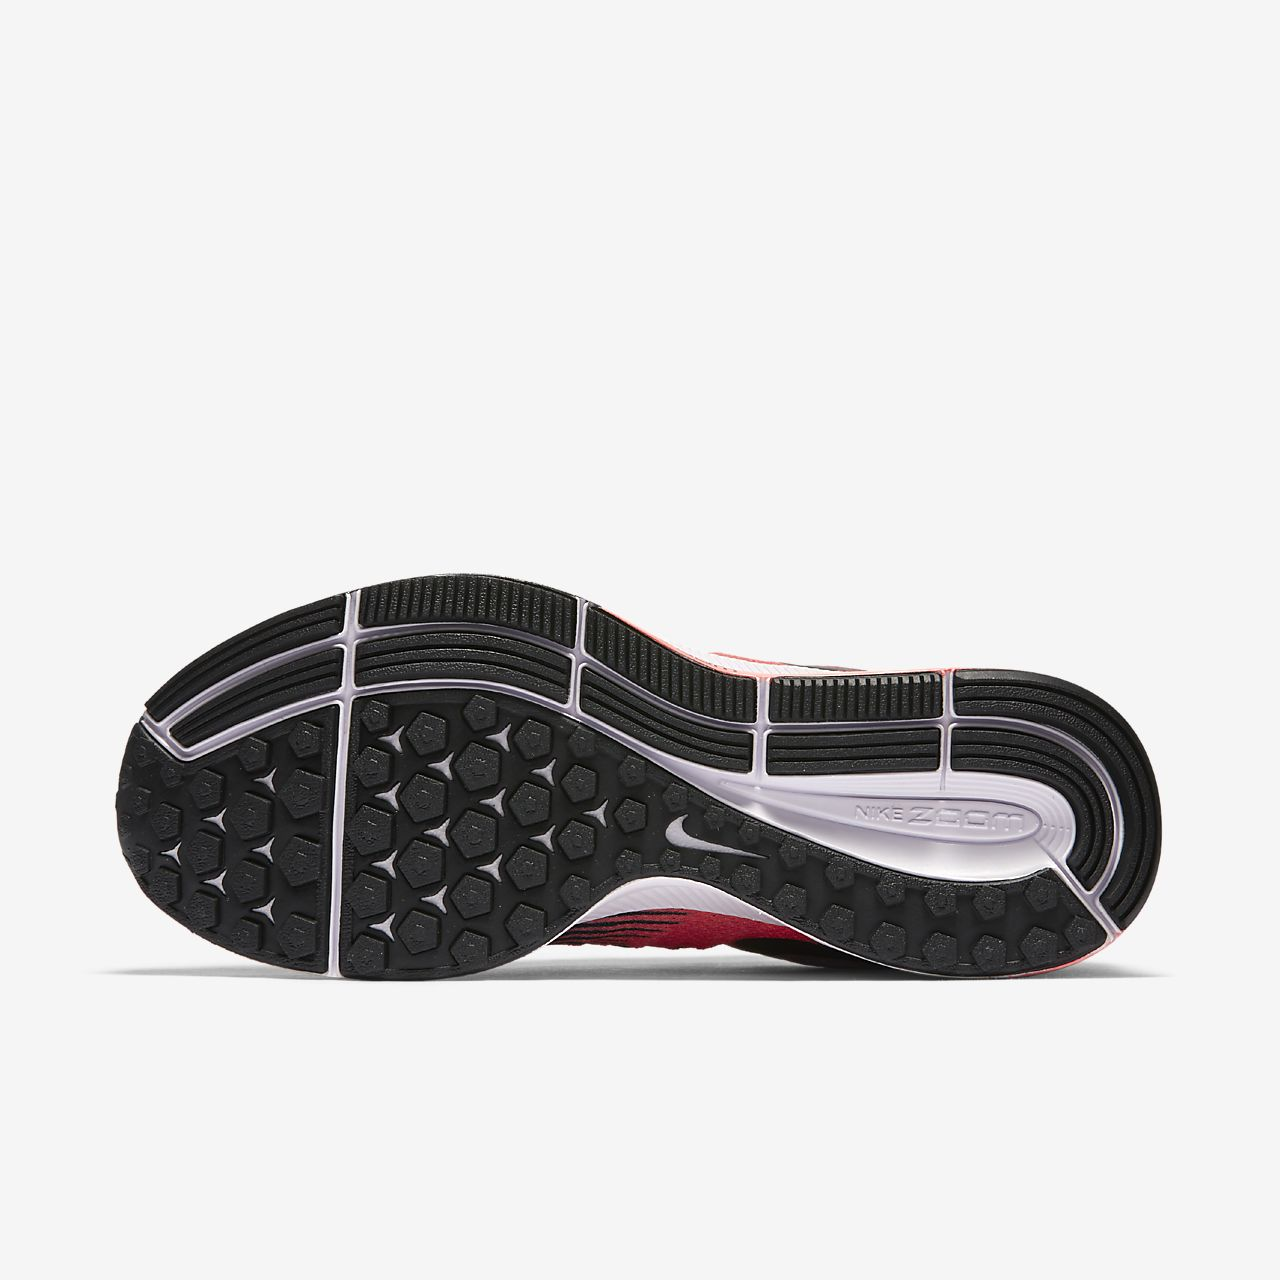 c7ffd67799dc Nike Air Zoom Pegasus 33 Women s Running Shoe. Nike.com MY